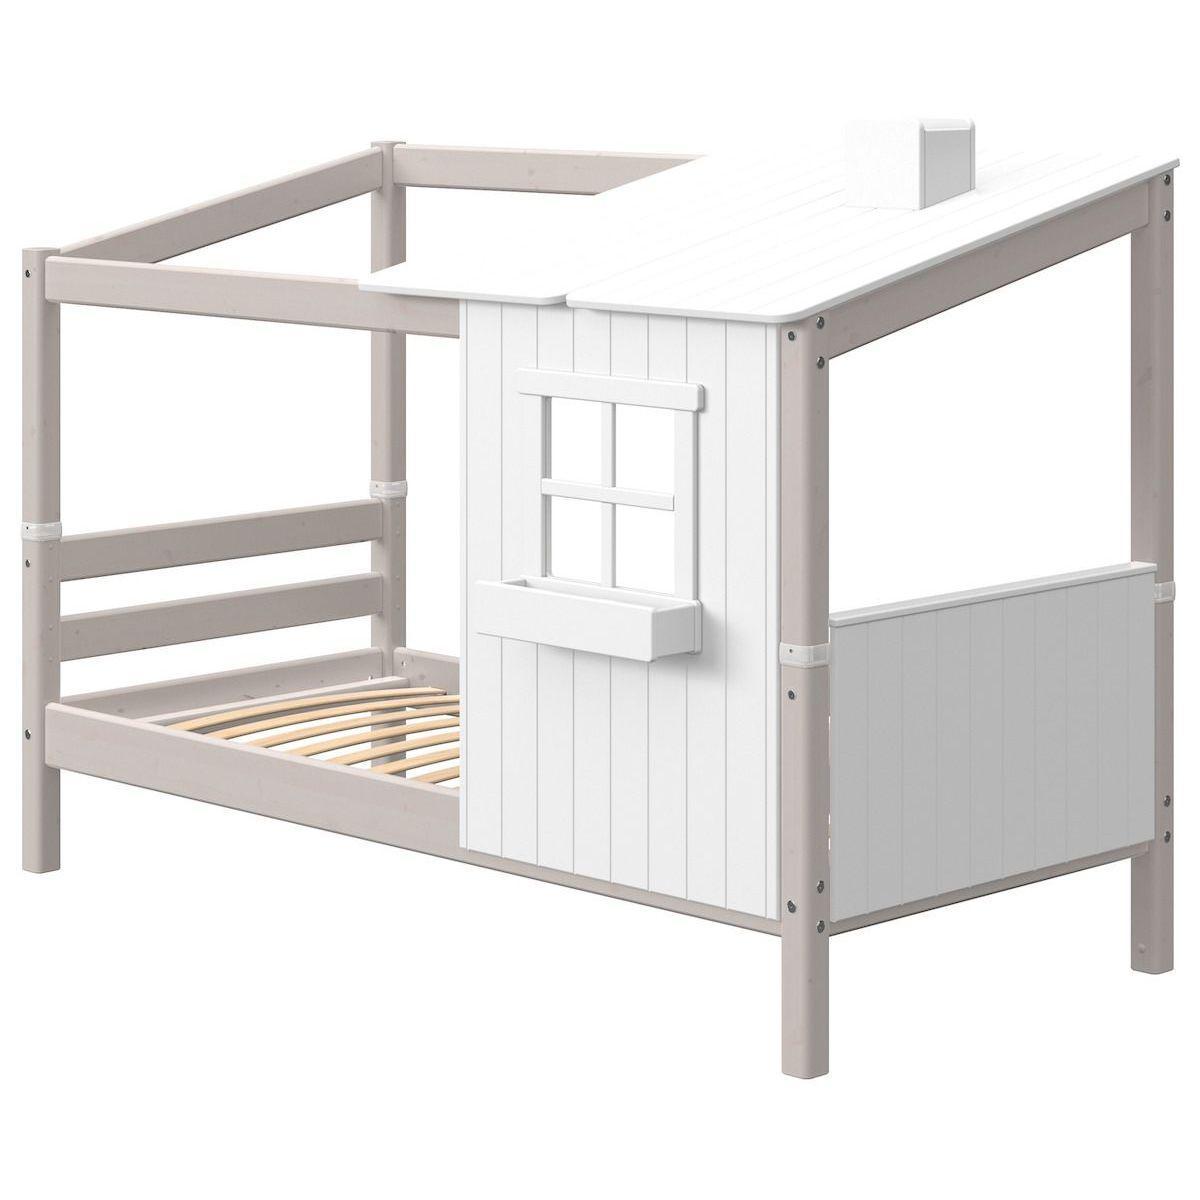 Spielbett Baumhaus 90x190cm 1-2 PLAY HOUSE CLASSIC Flexa weiß-grey washed